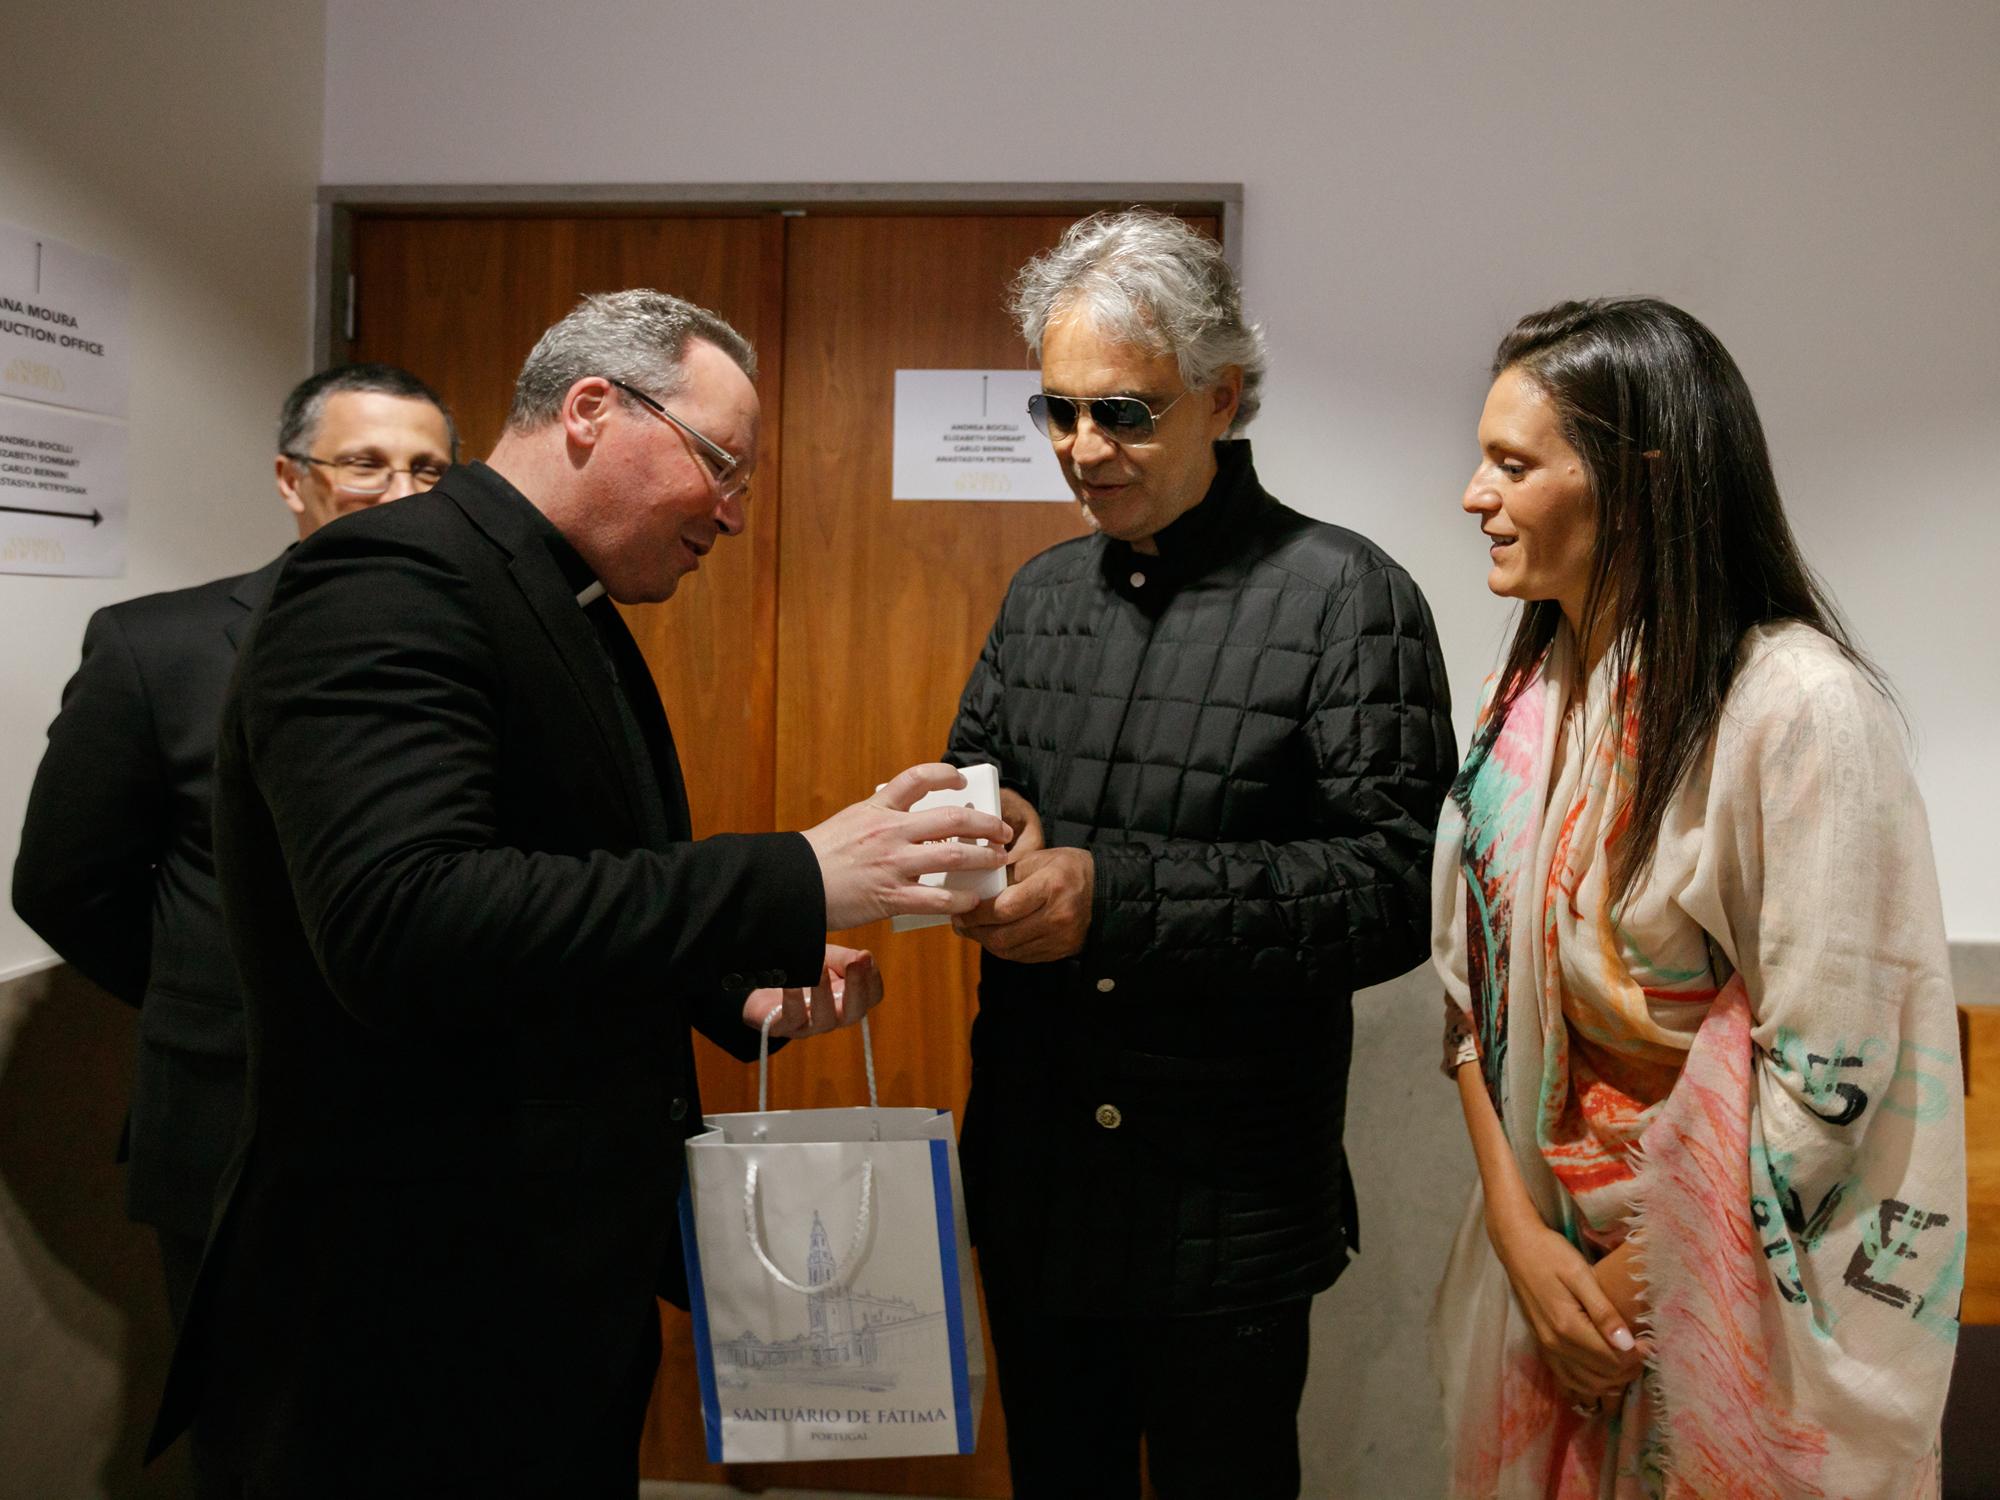 2018-05-11_Medalha_Bocelli_2.jpg